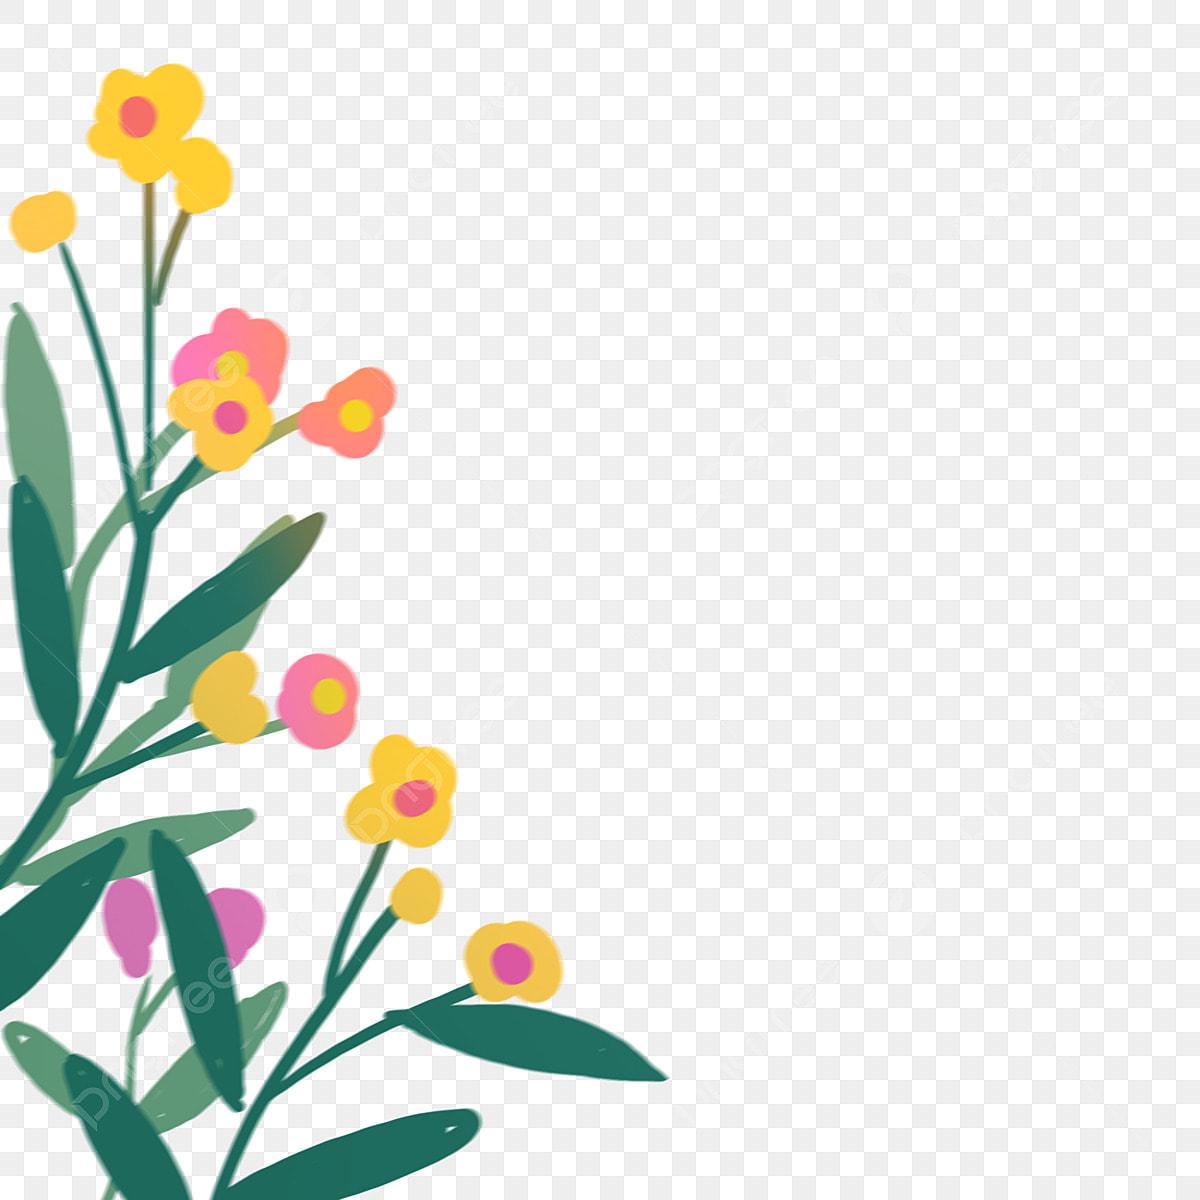 Spring Flowers Spring Flower Clip Art Clipart Free - Spring Flowers  Transparent Background, HD Png Download - kindpng